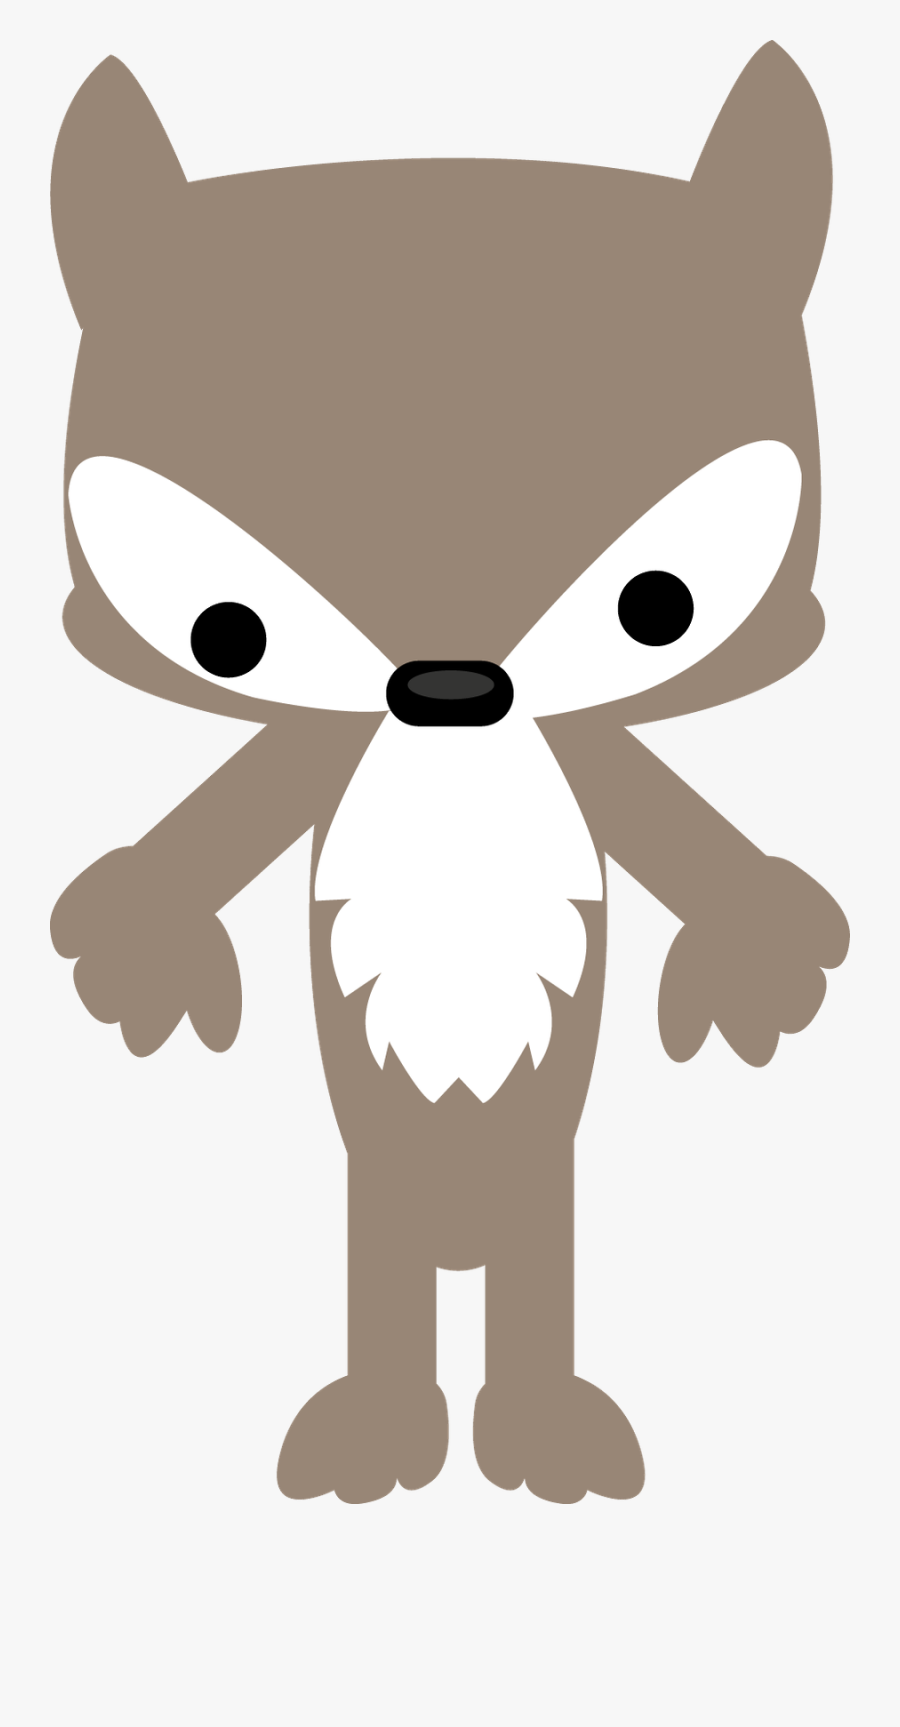 Transparent Wolf Clipart - Cute Little Red Riding Hood Wolf, Transparent Clipart